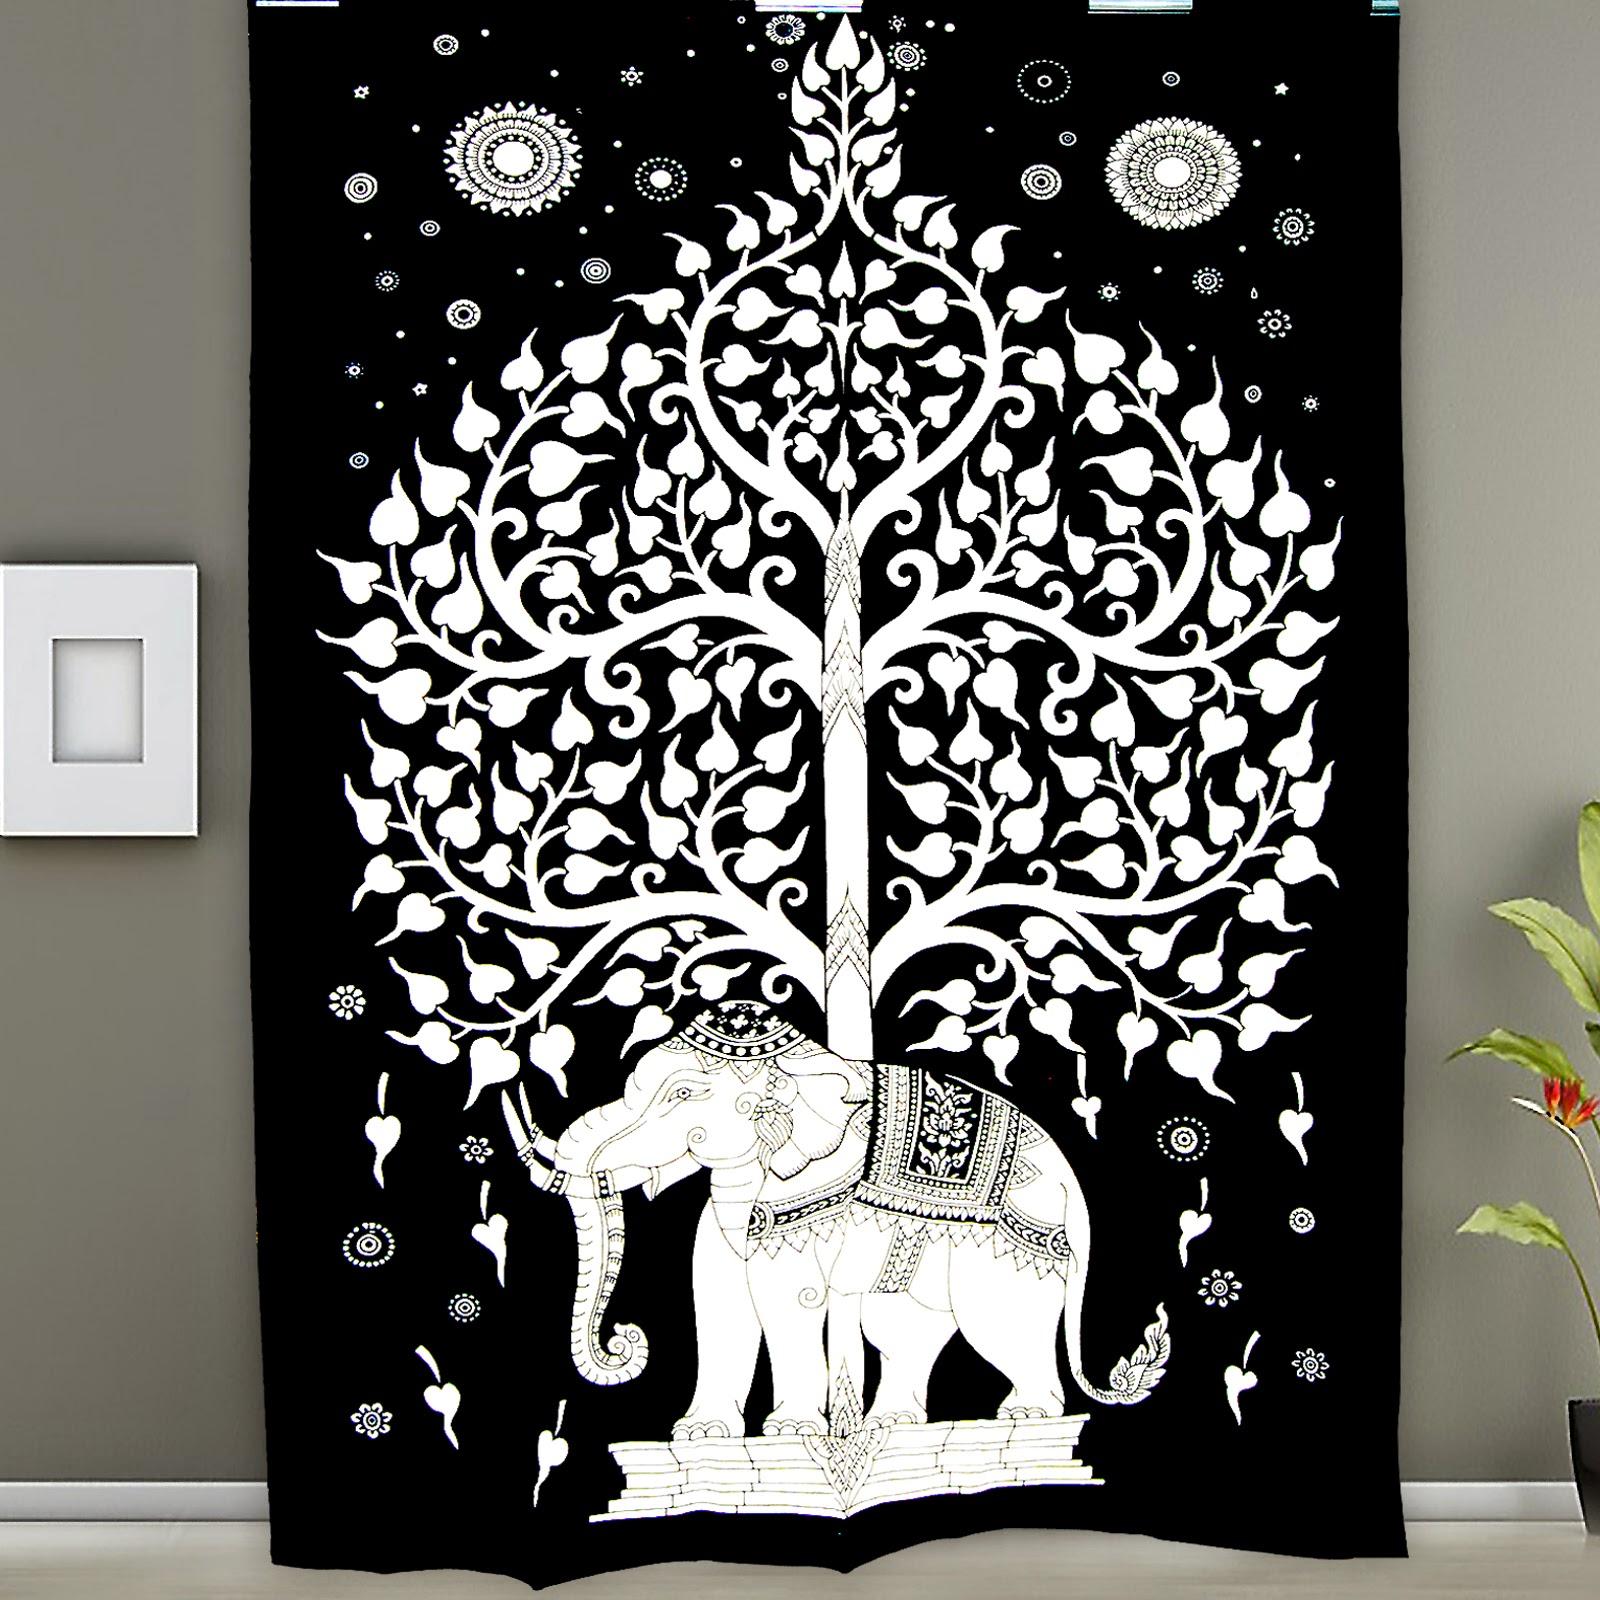 Hippie Tapestries Mandala Tapestries Queen Boho Tapestries Wall